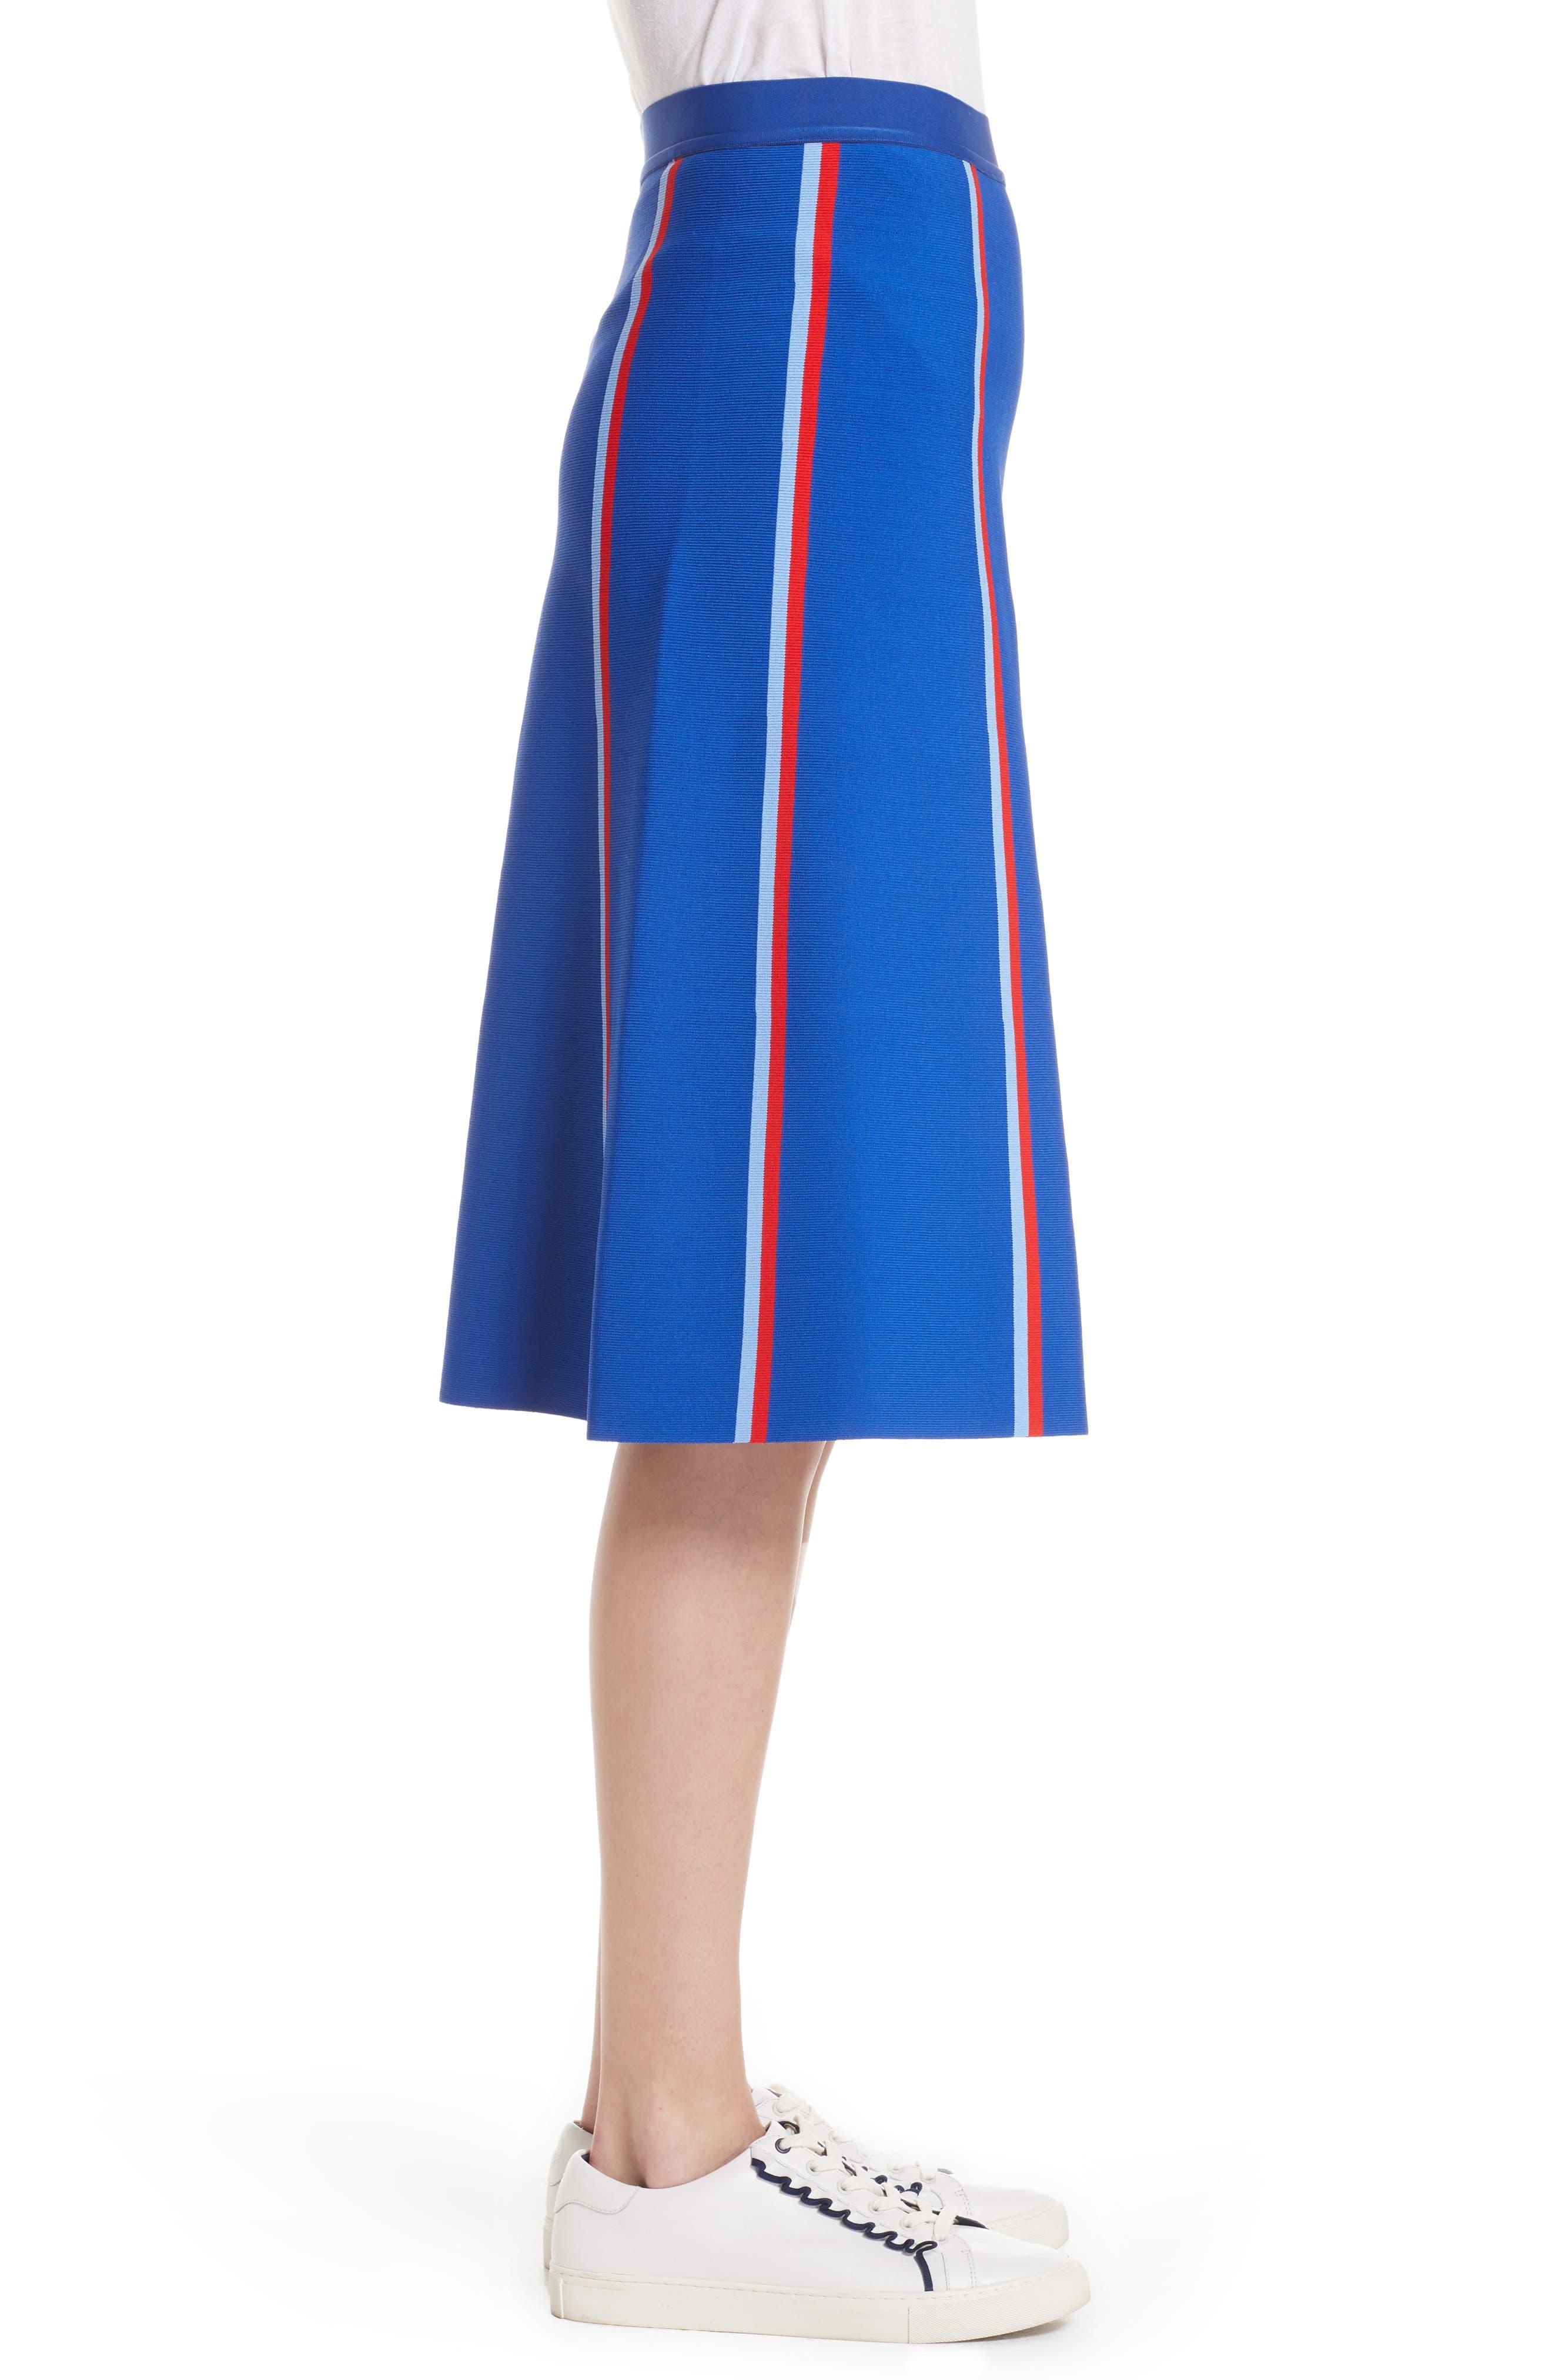 Twin Stripe Tech Knit Skirt,                             Alternate thumbnail 3, color,                             SLALOM BLUE